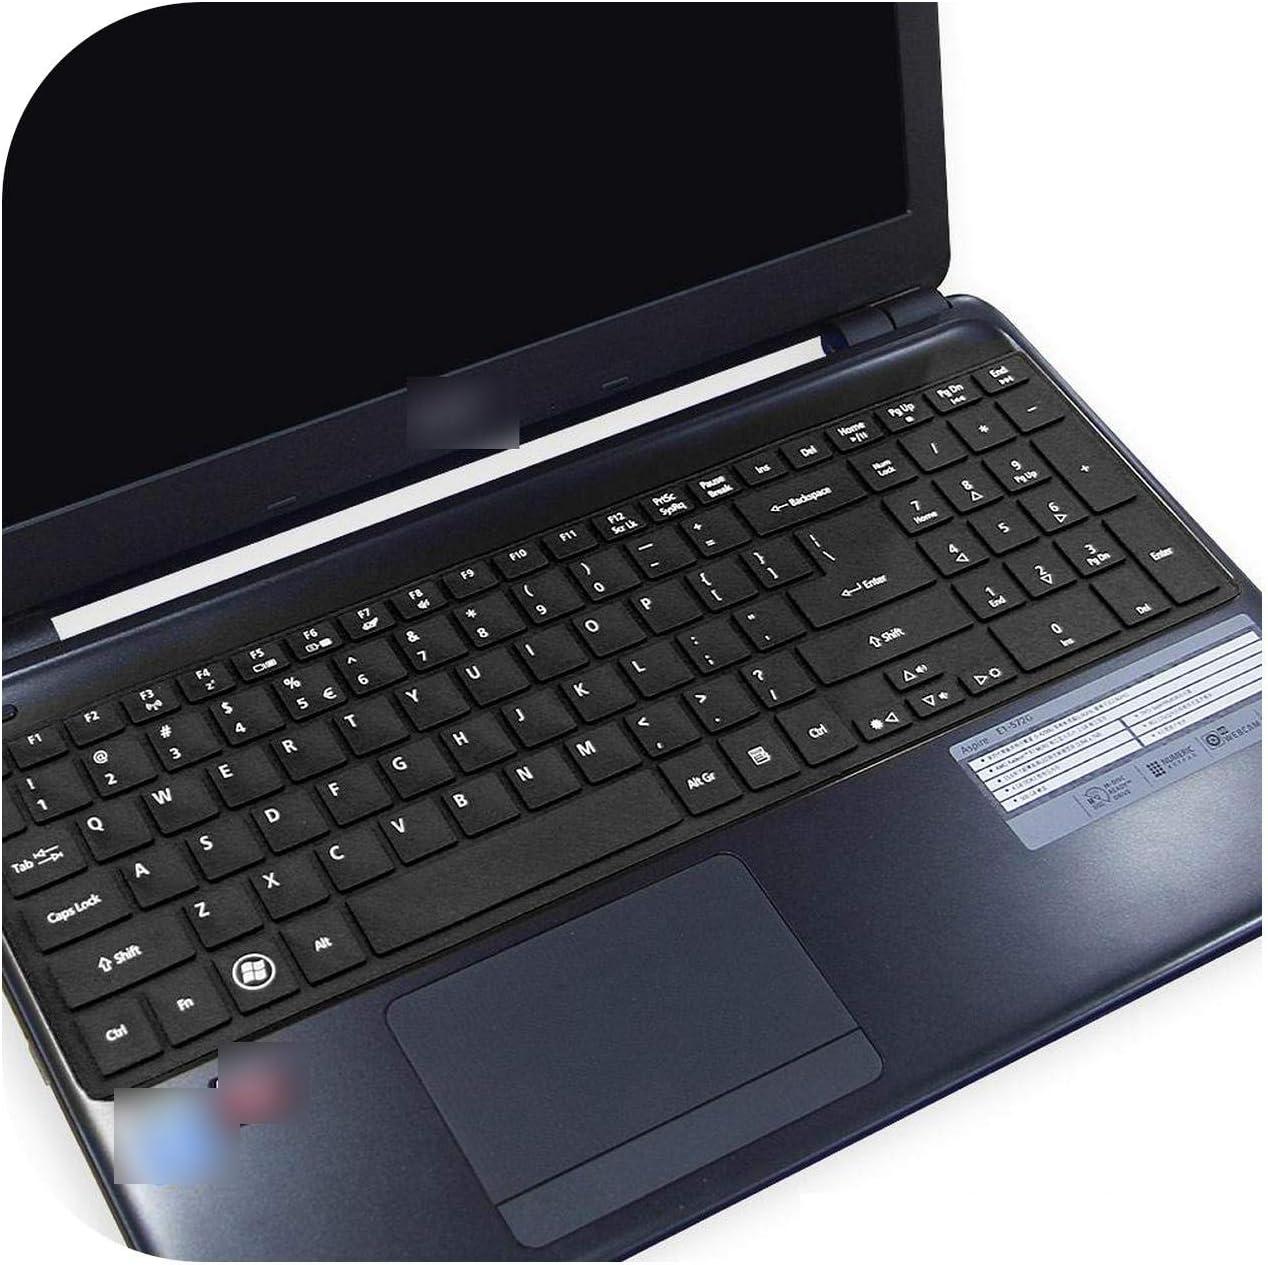 15 Inch Ultra Thin Keyboard Cover Protector Skin for Acer Aspire E5 521 E5 521G E5 551 E5 551G E5 571 E5 571G V5 561 V5 561Pg-Allblack-